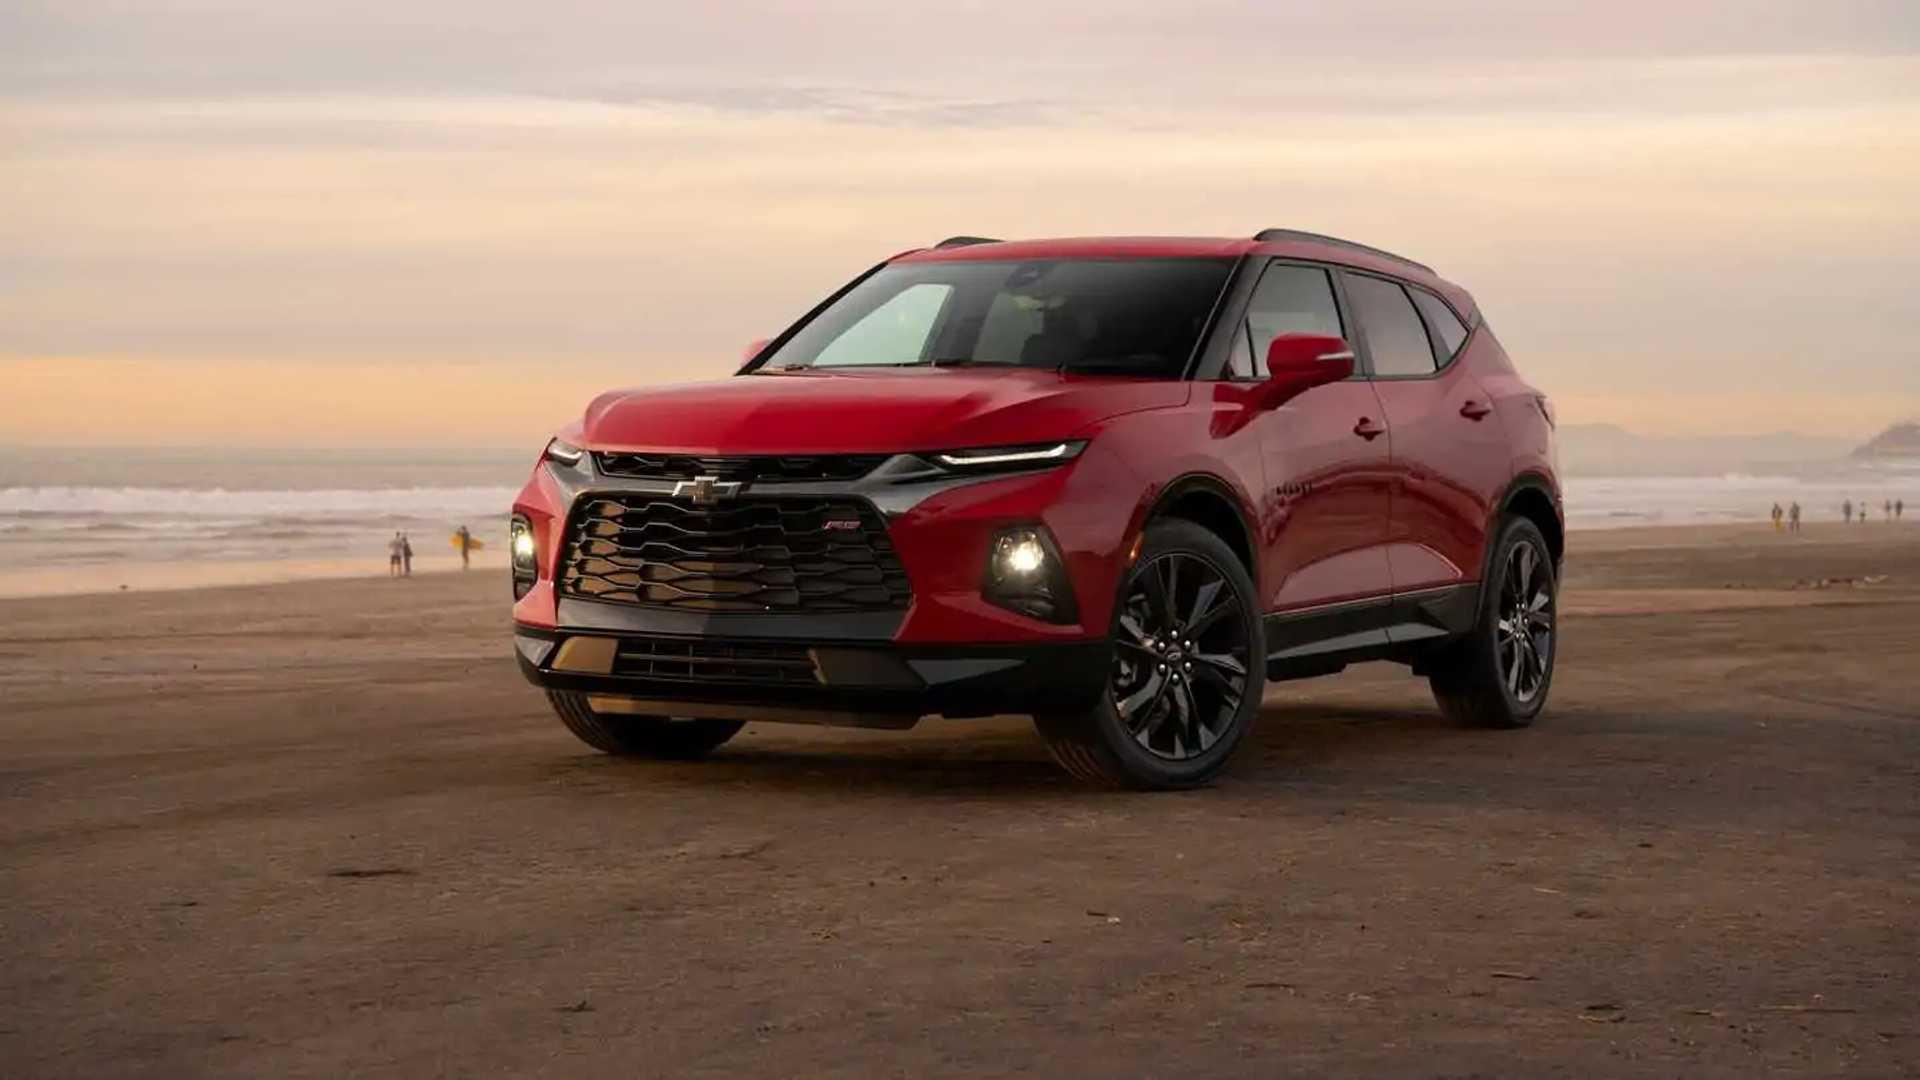 2019 Chevrolet Blazer RS First Drive: Don't Blaze Me, Bro!